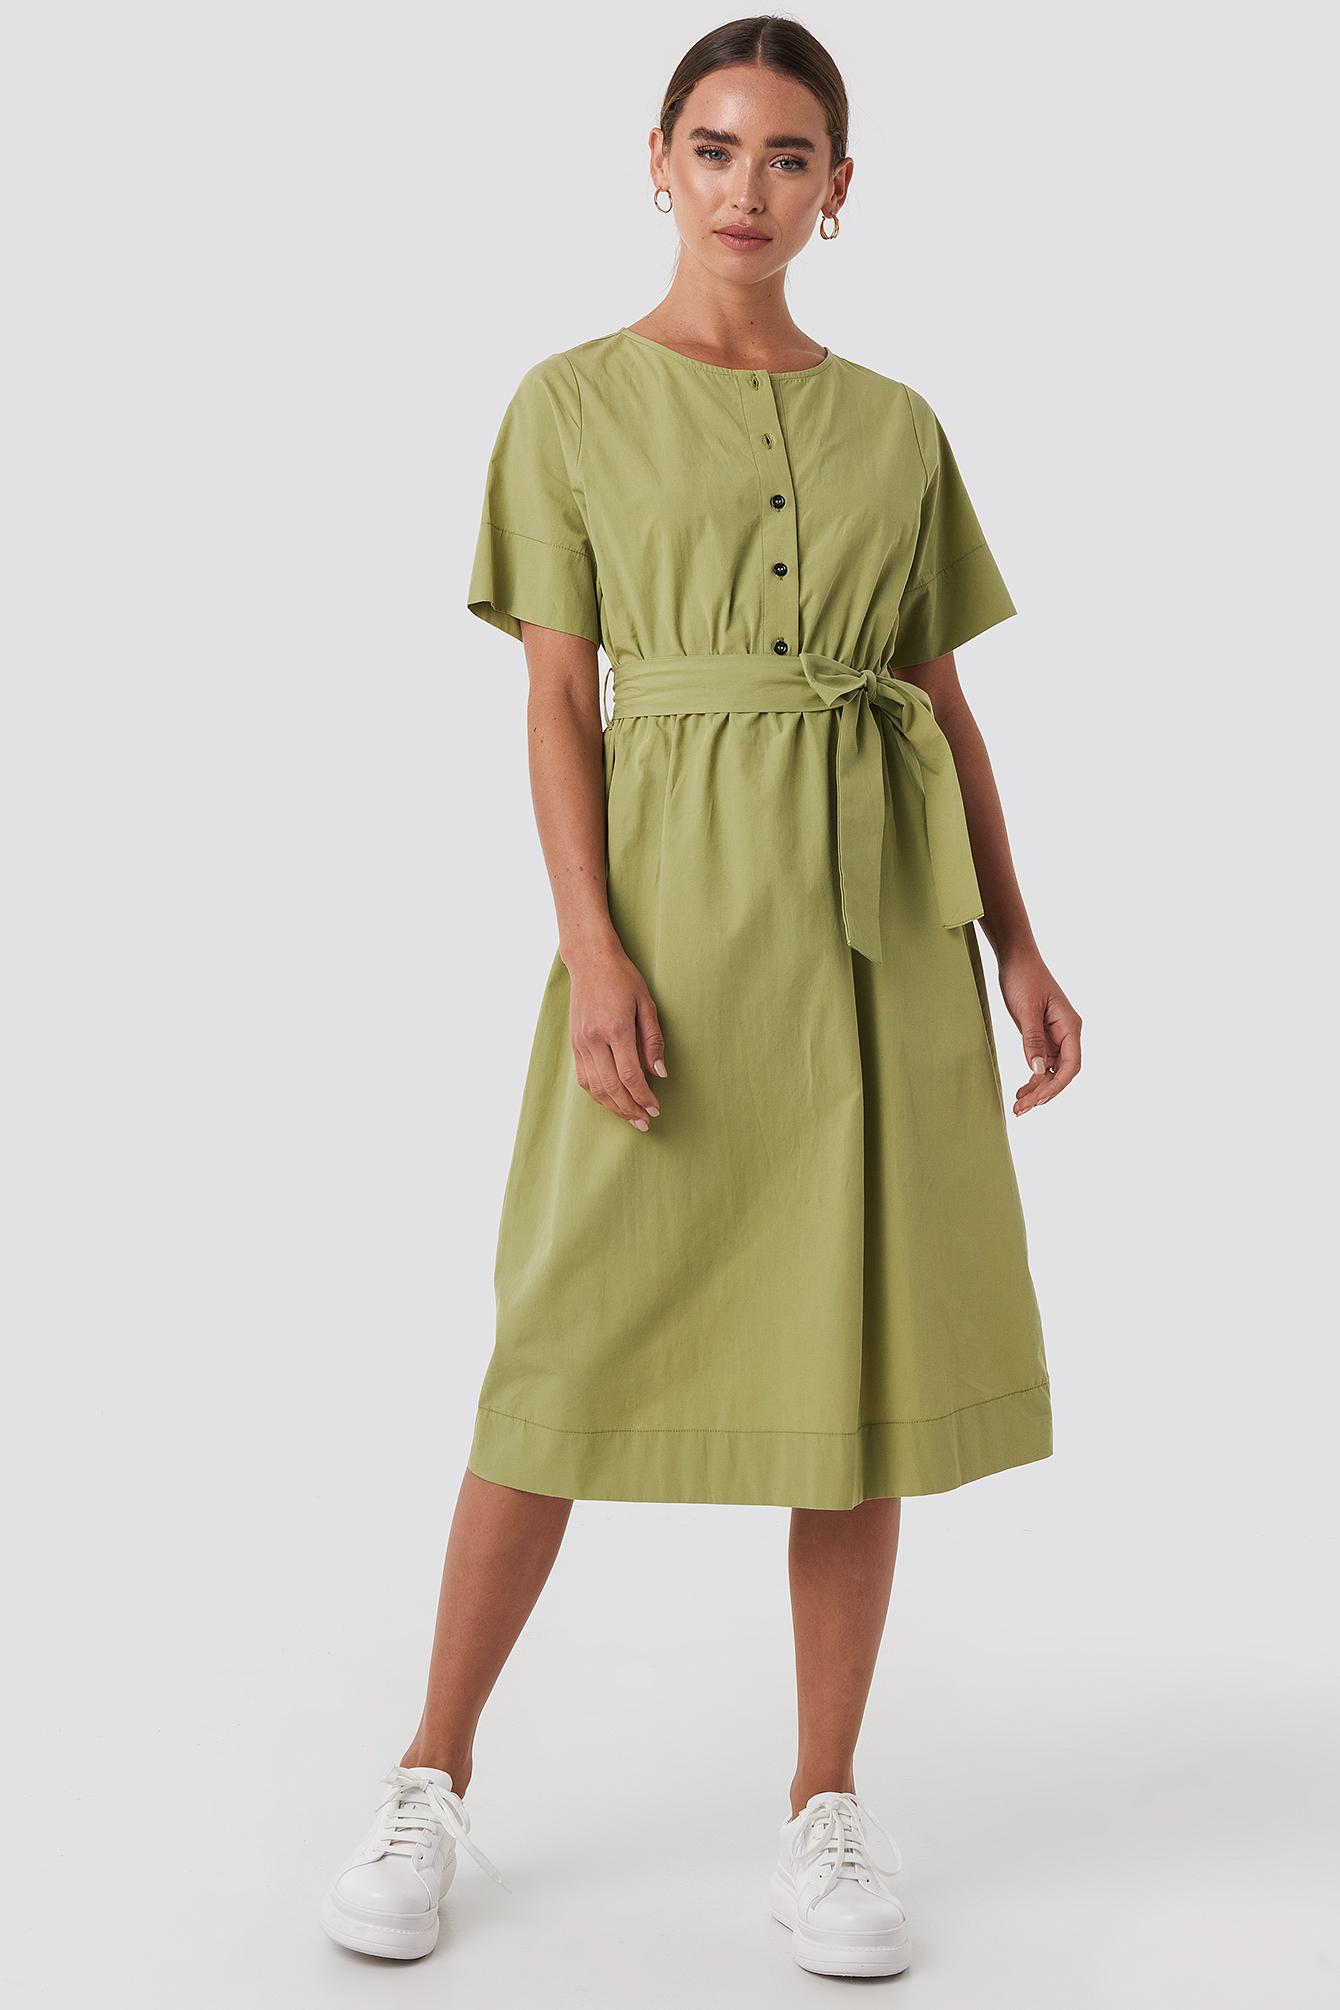 NA-KD Round Neck Button Up Midi Dress - Green